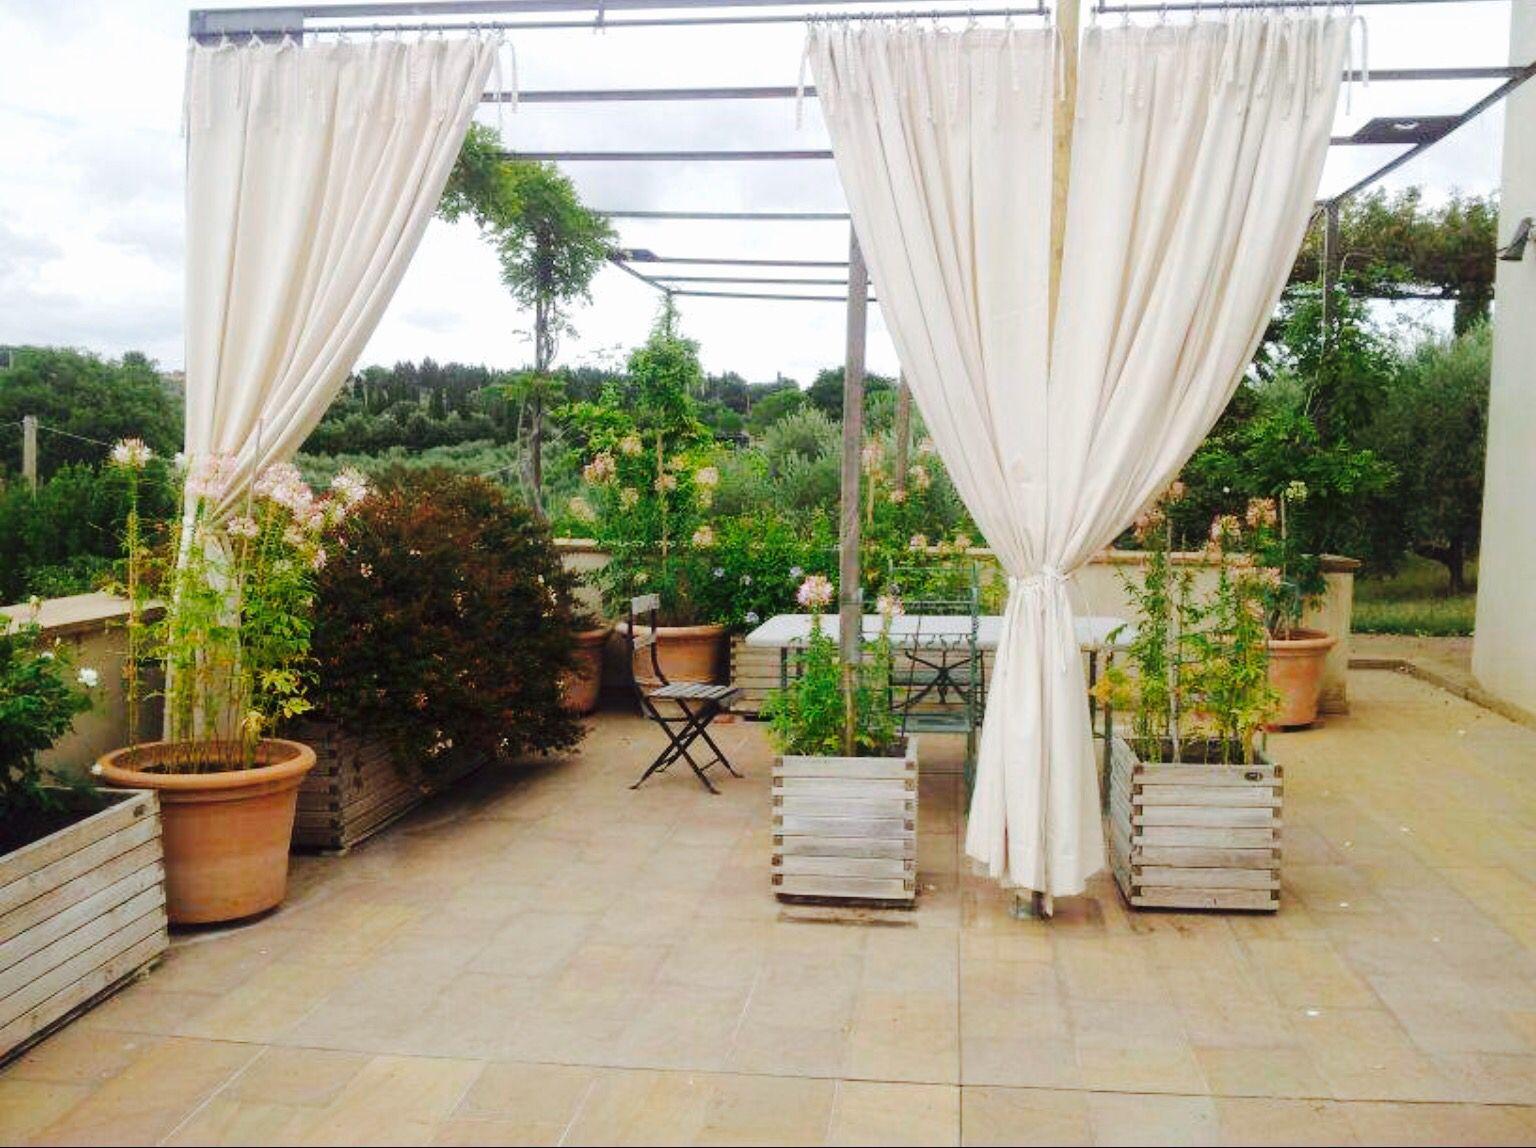 Tende in tela di puro cotone per terrazza | casabella tende | Pinterest